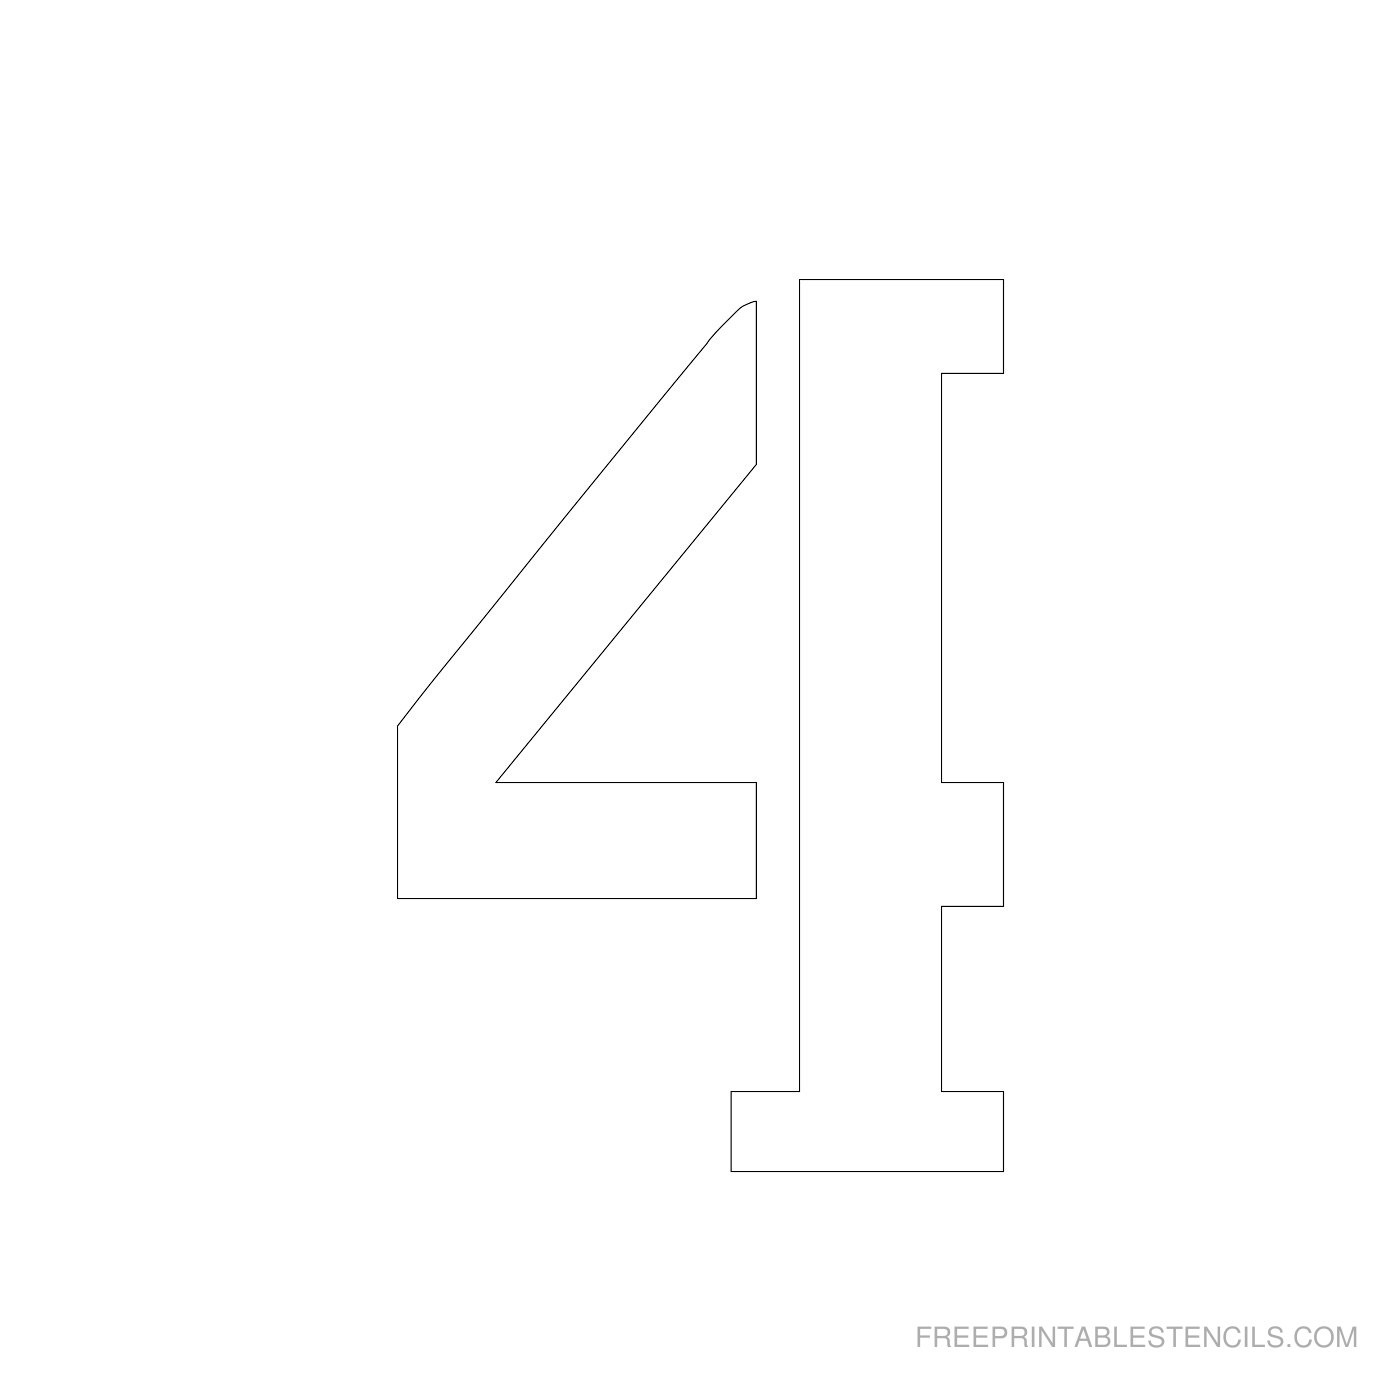 Printable 4 Inch Number Stencils 1-10   Free Printable Stencils - Free Printable 4 Inch Number Stencils